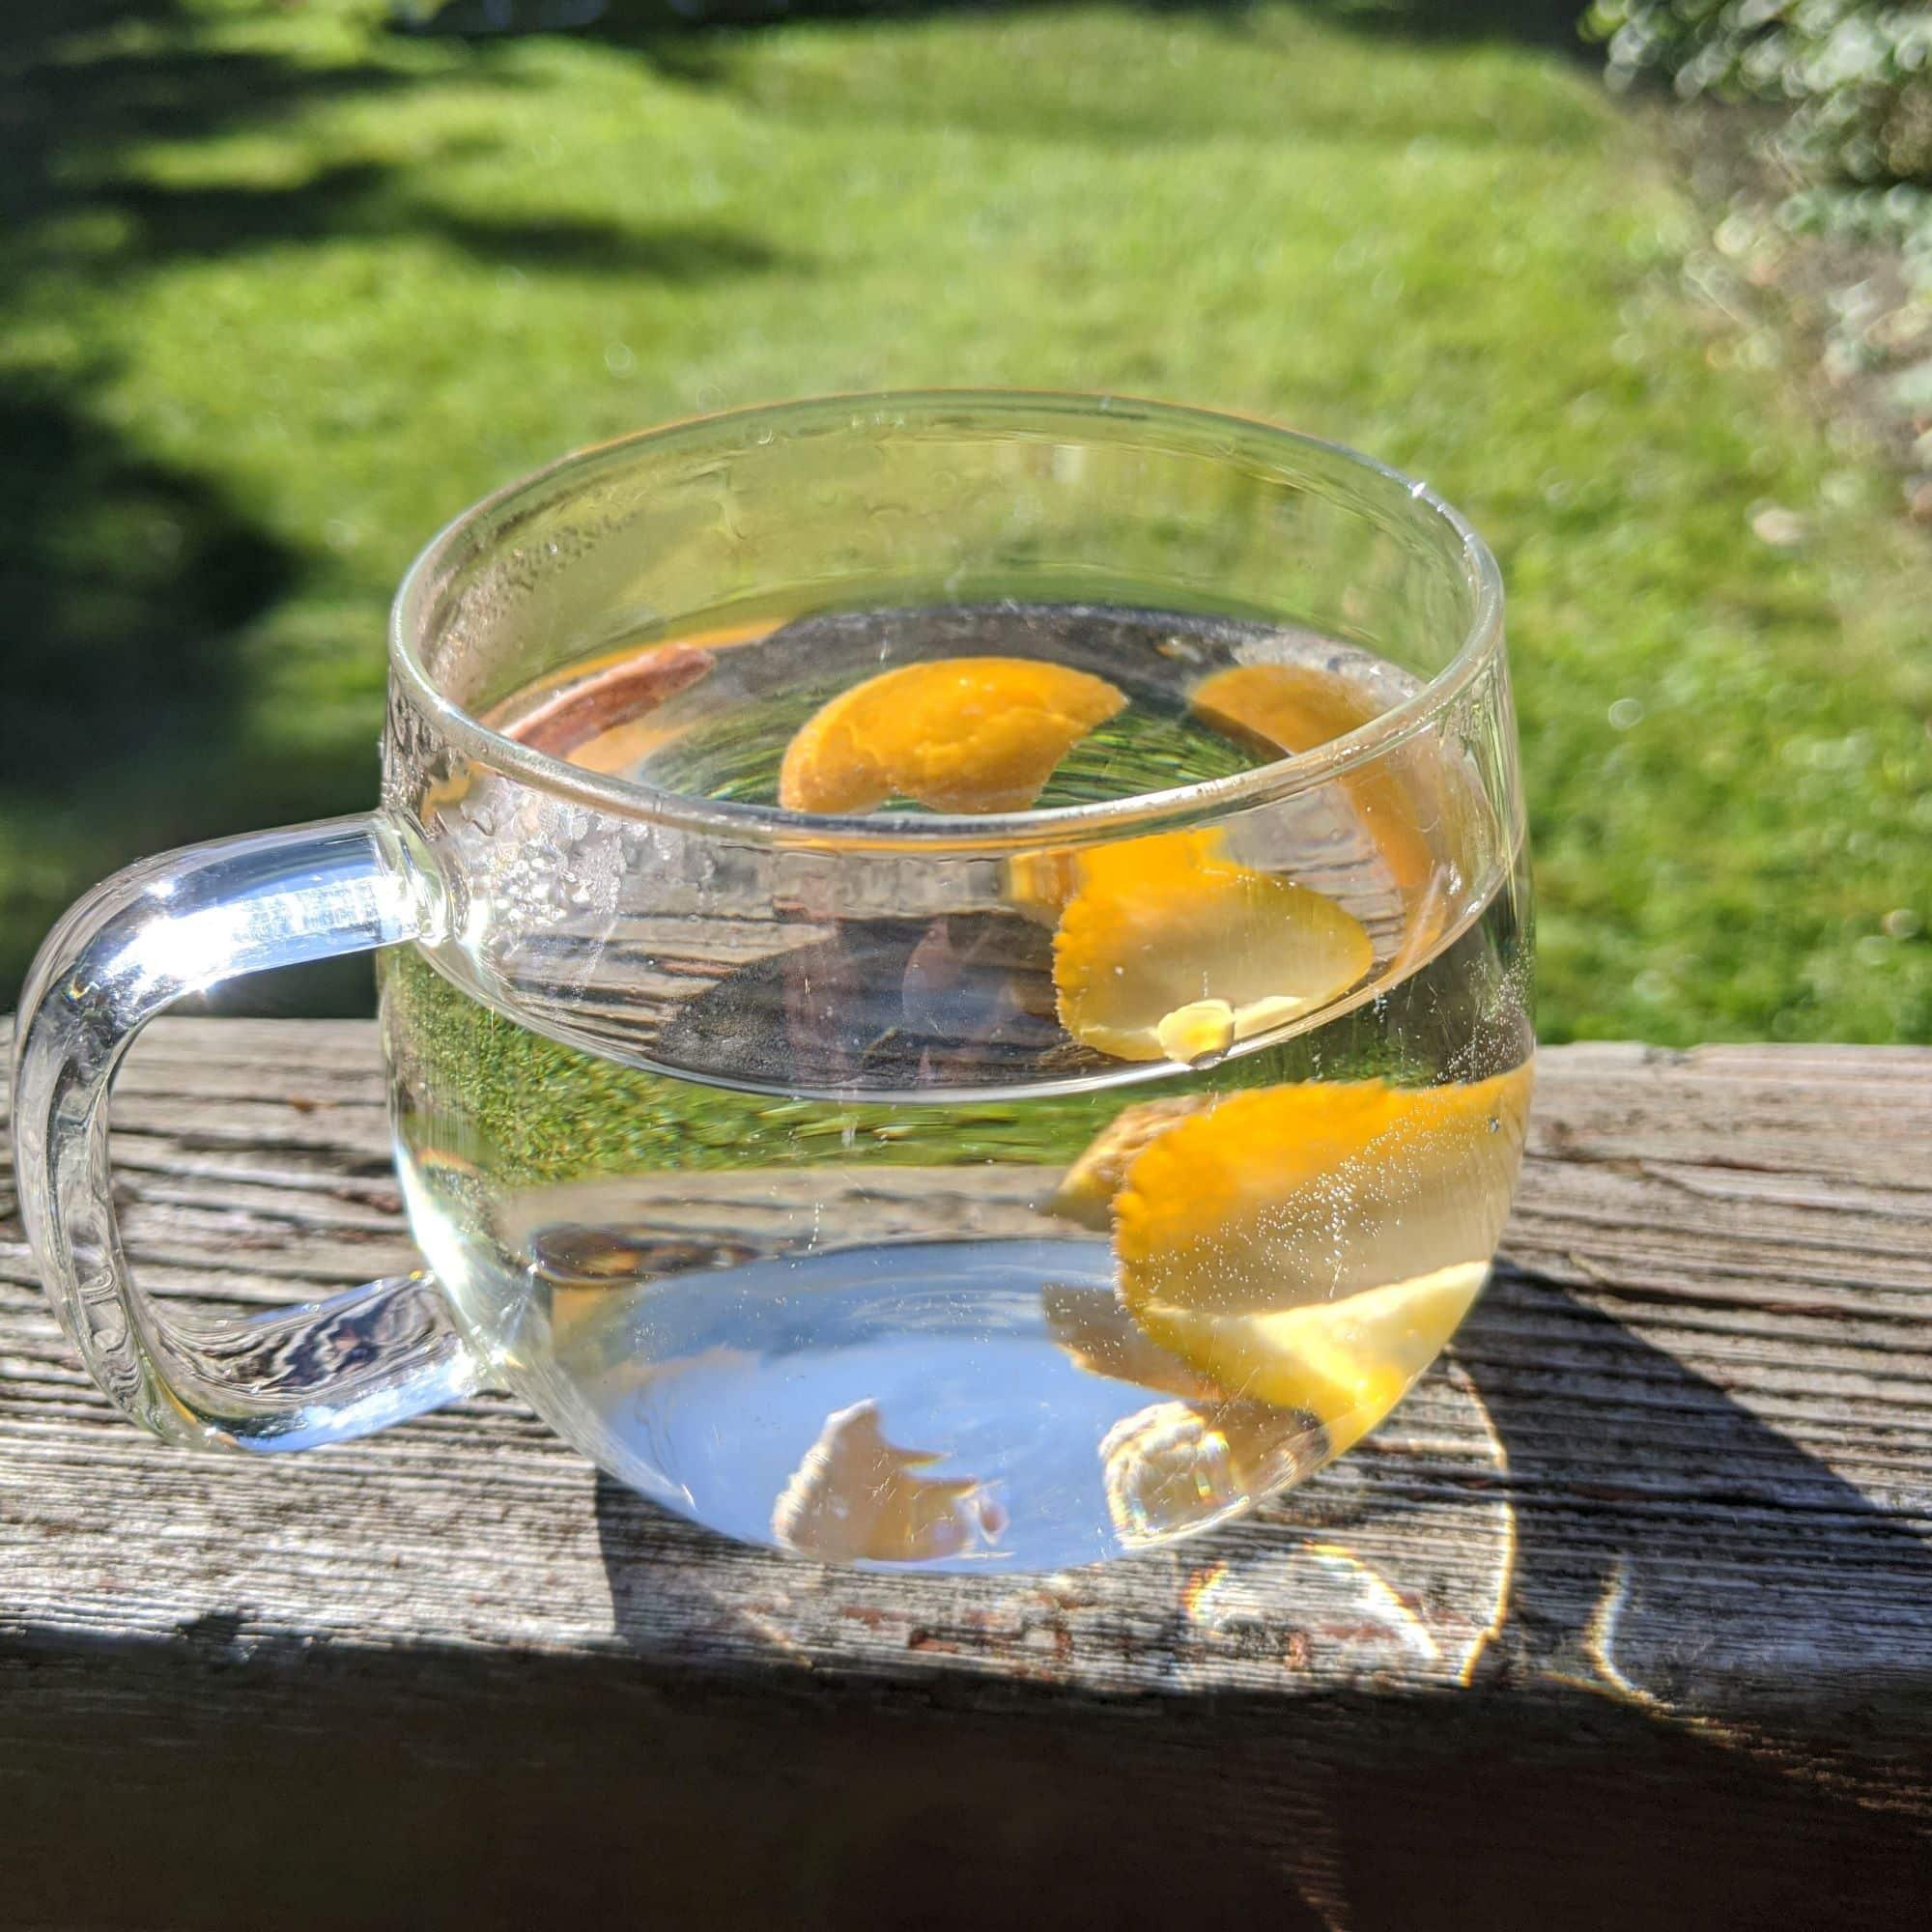 Best Tea for a Cold - Orange Peel Tea